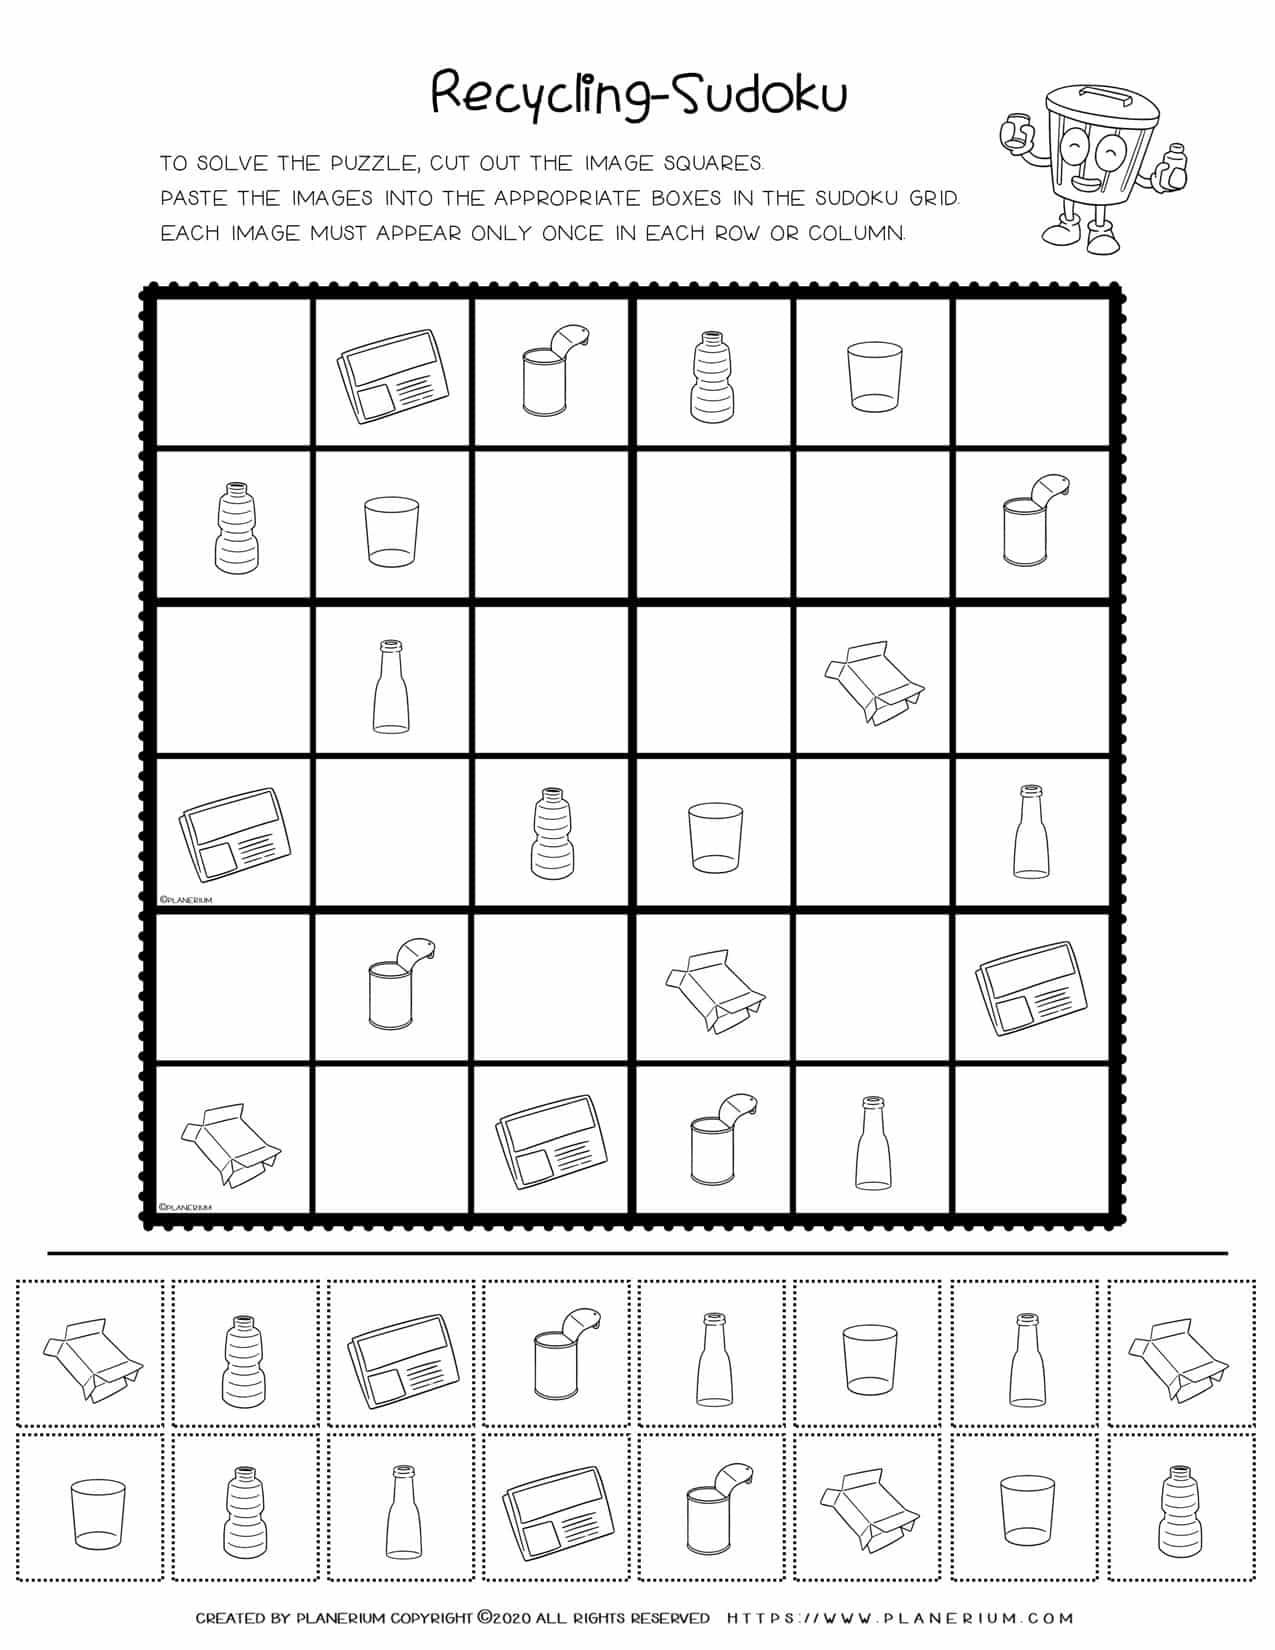 Earth Day Sudoku Puzzle - Advanced | Planerium